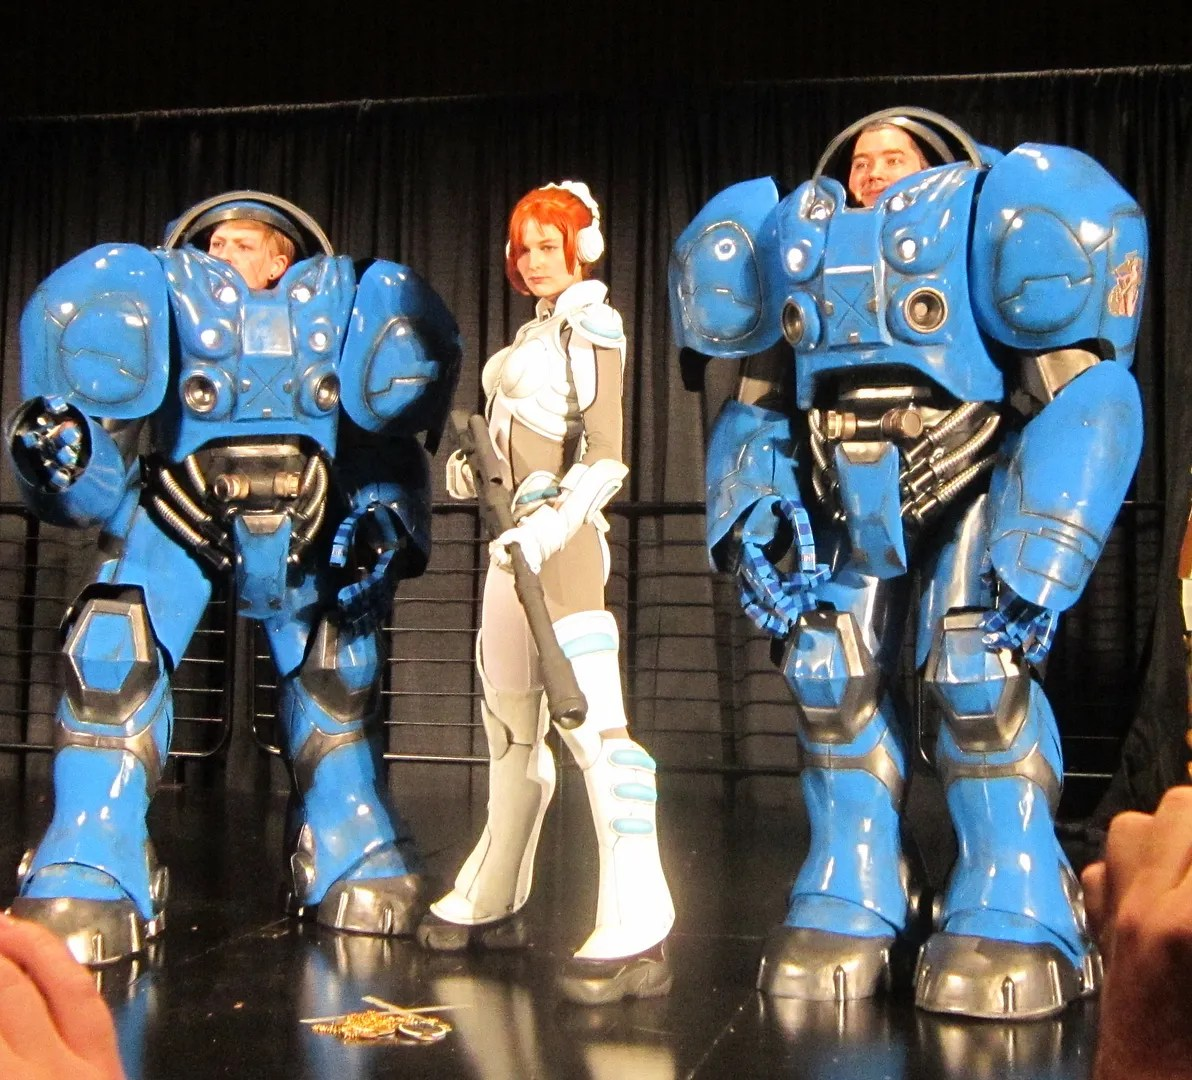 Sarah Kerrigan, Space Marines, StarCraft, GenCon 2013